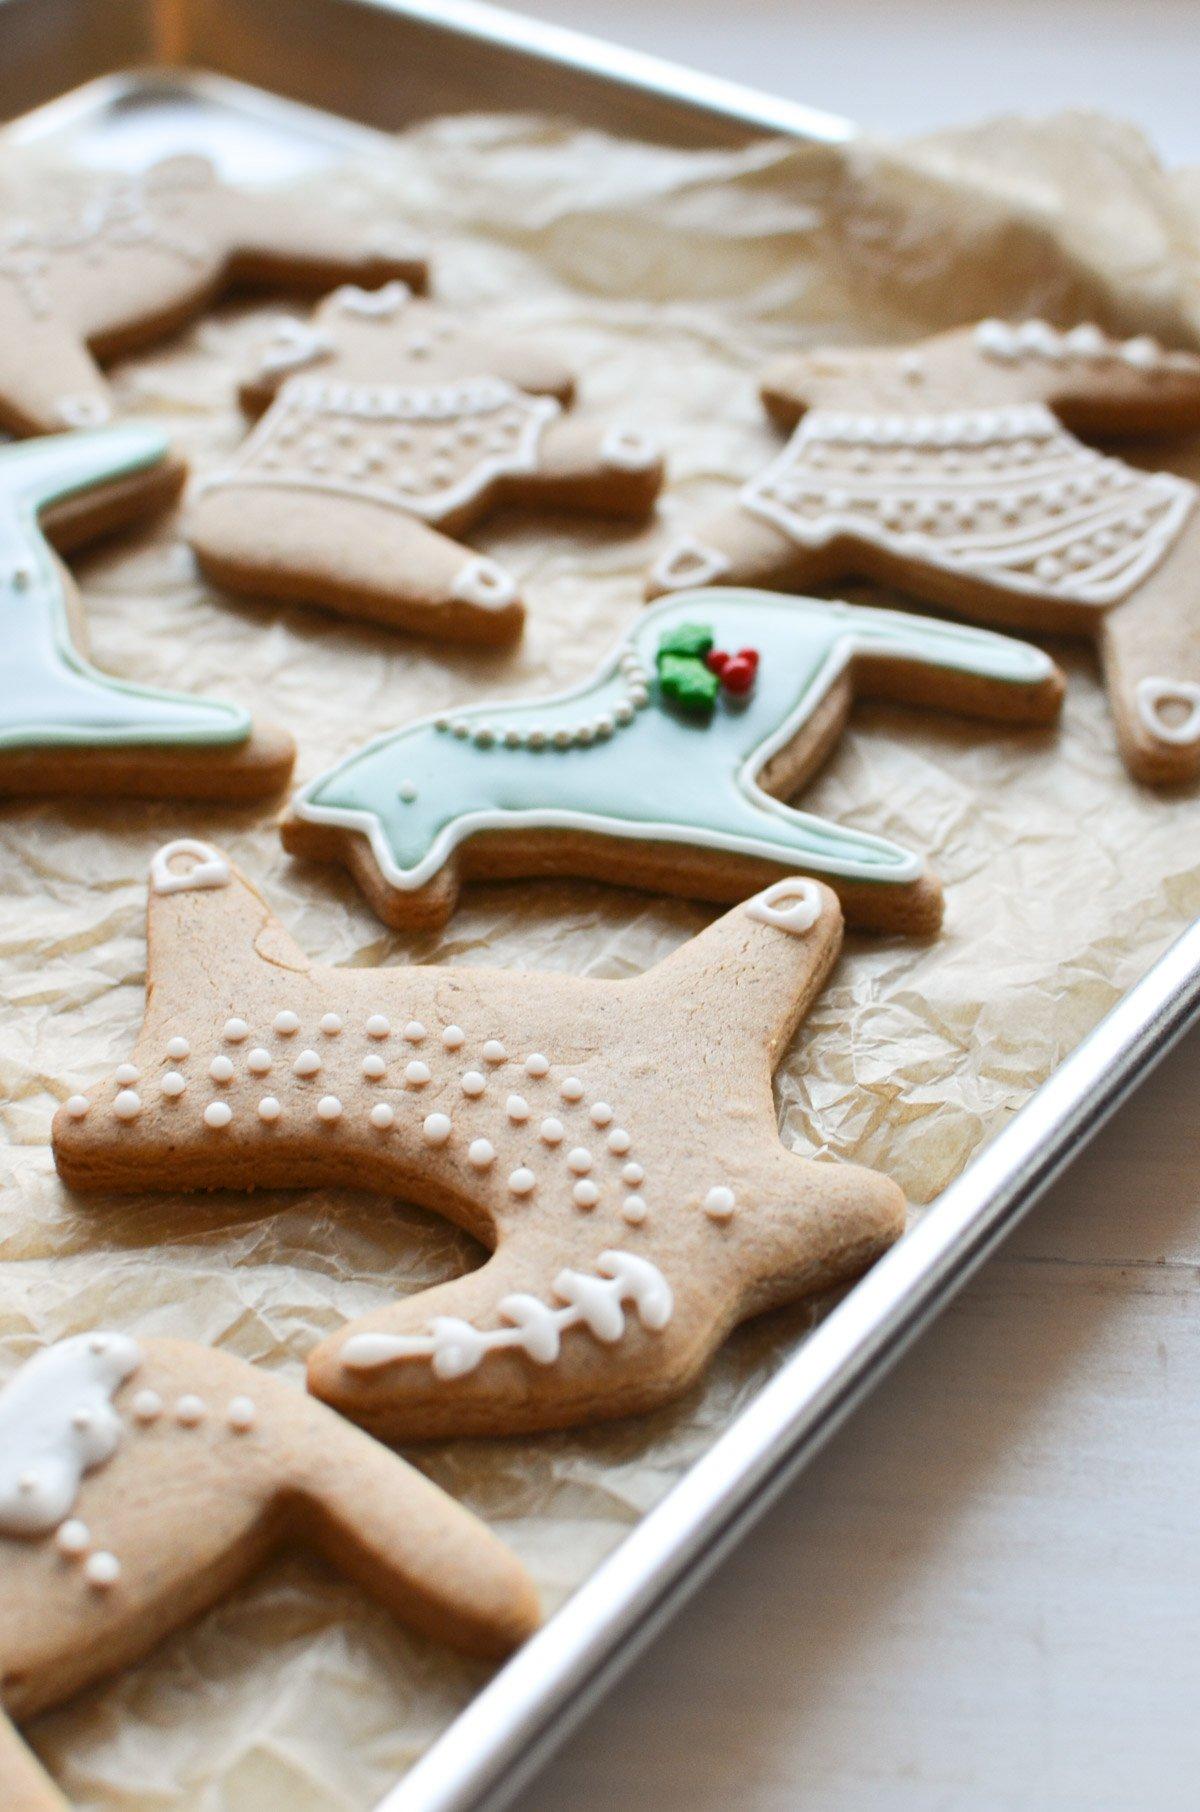 Pepparkakor cookies on a baking sheet